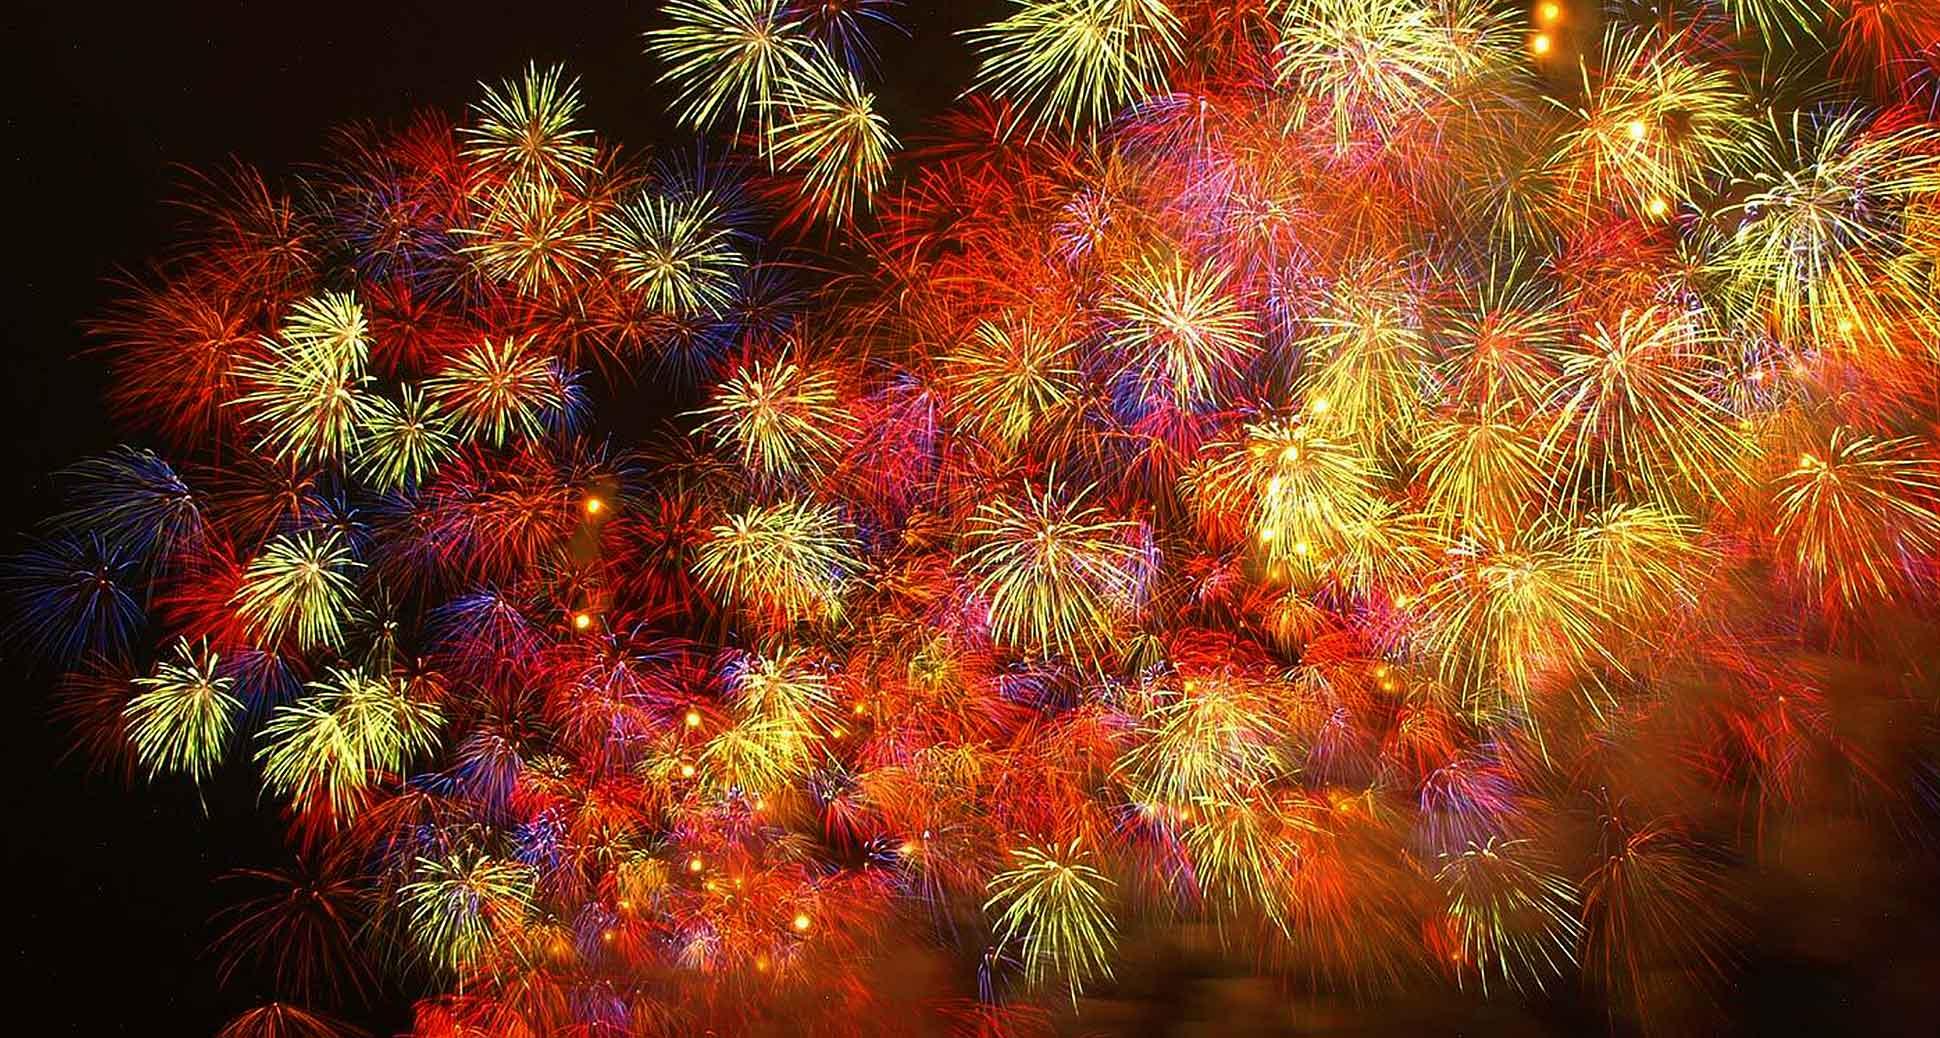 Celebrating vancouver fireworks 2015